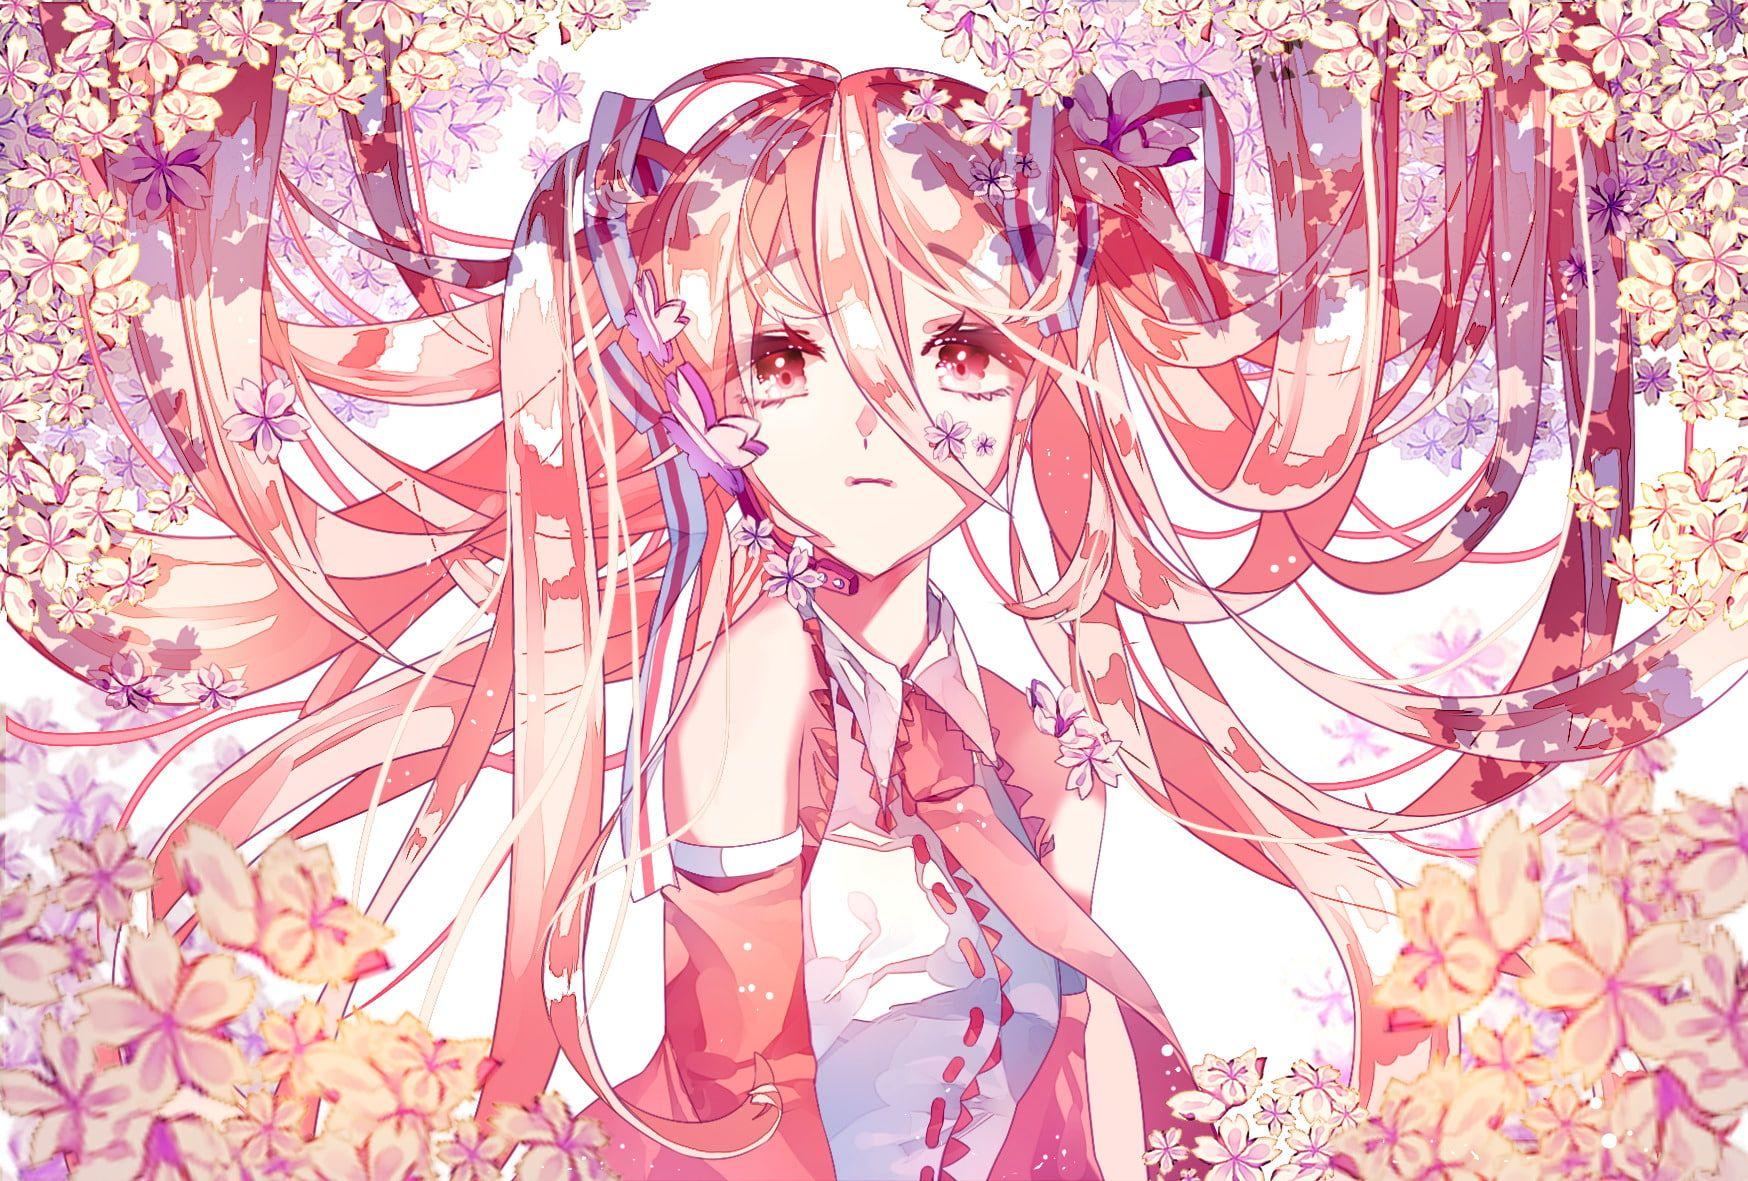 Anime Vocaloid Sakura Miku 720p Wallpaper Hdwallpaper Desktop In 2020 Hatsune Miku Anime Vocaloid